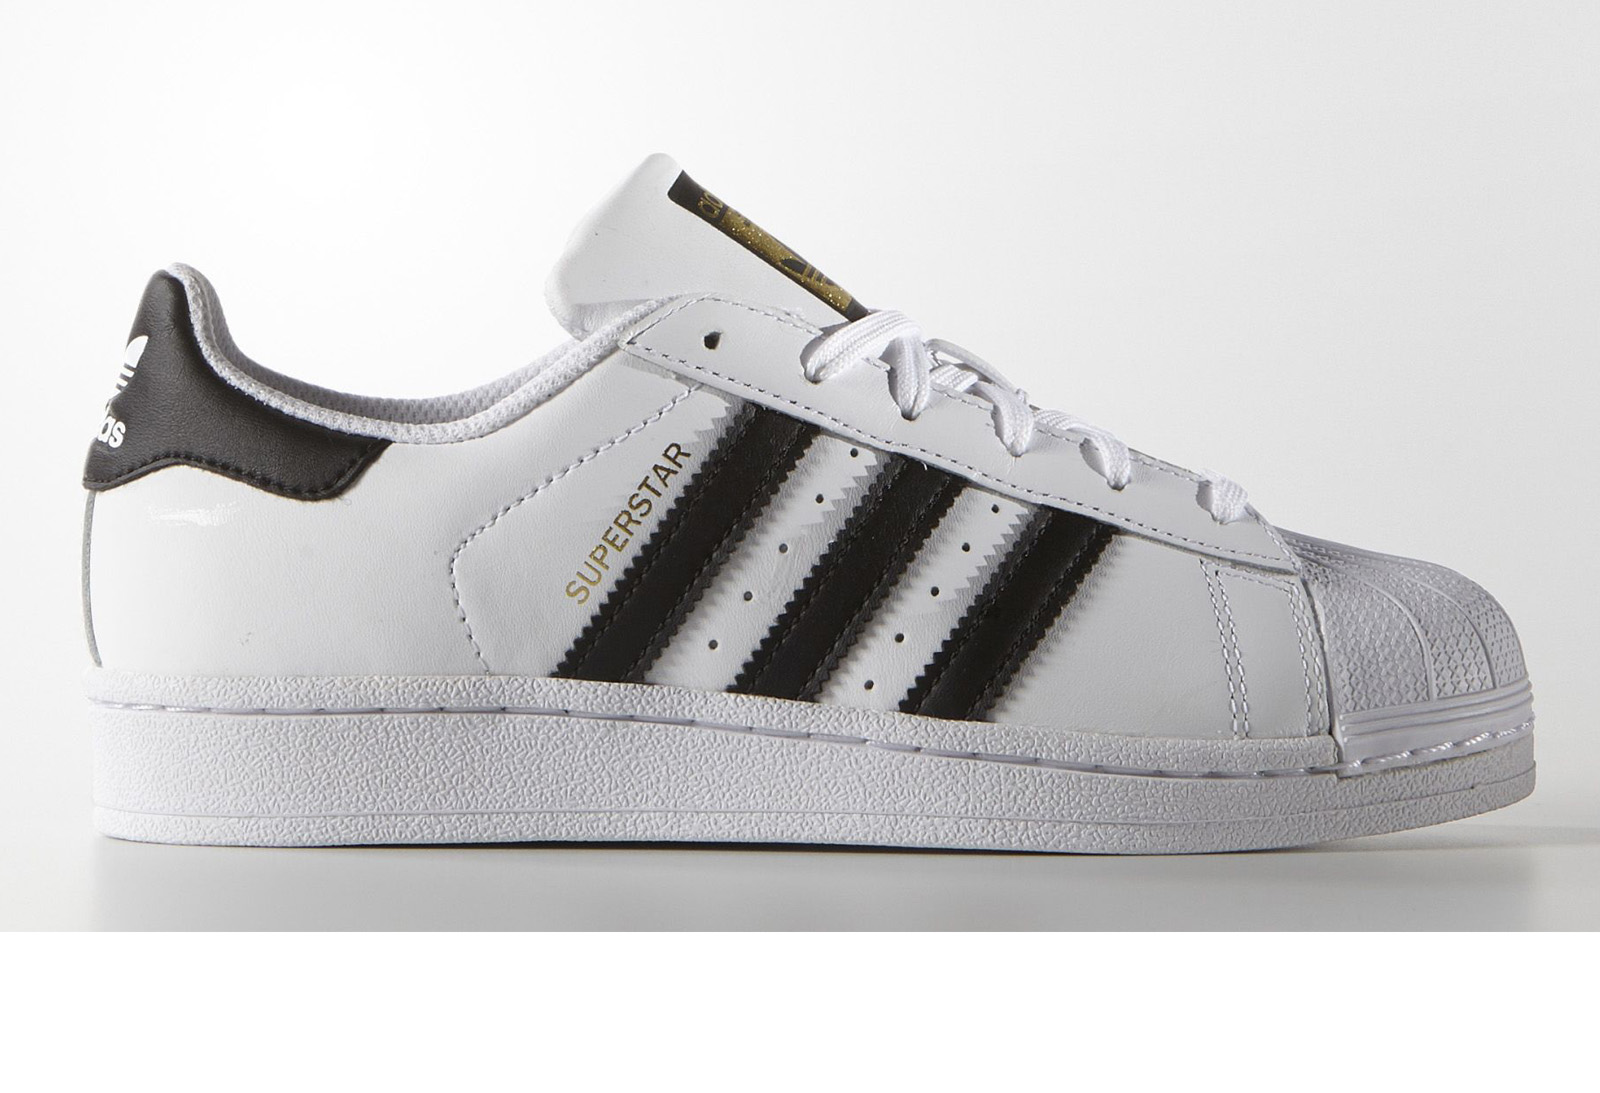 Samoa Shoes Black And White